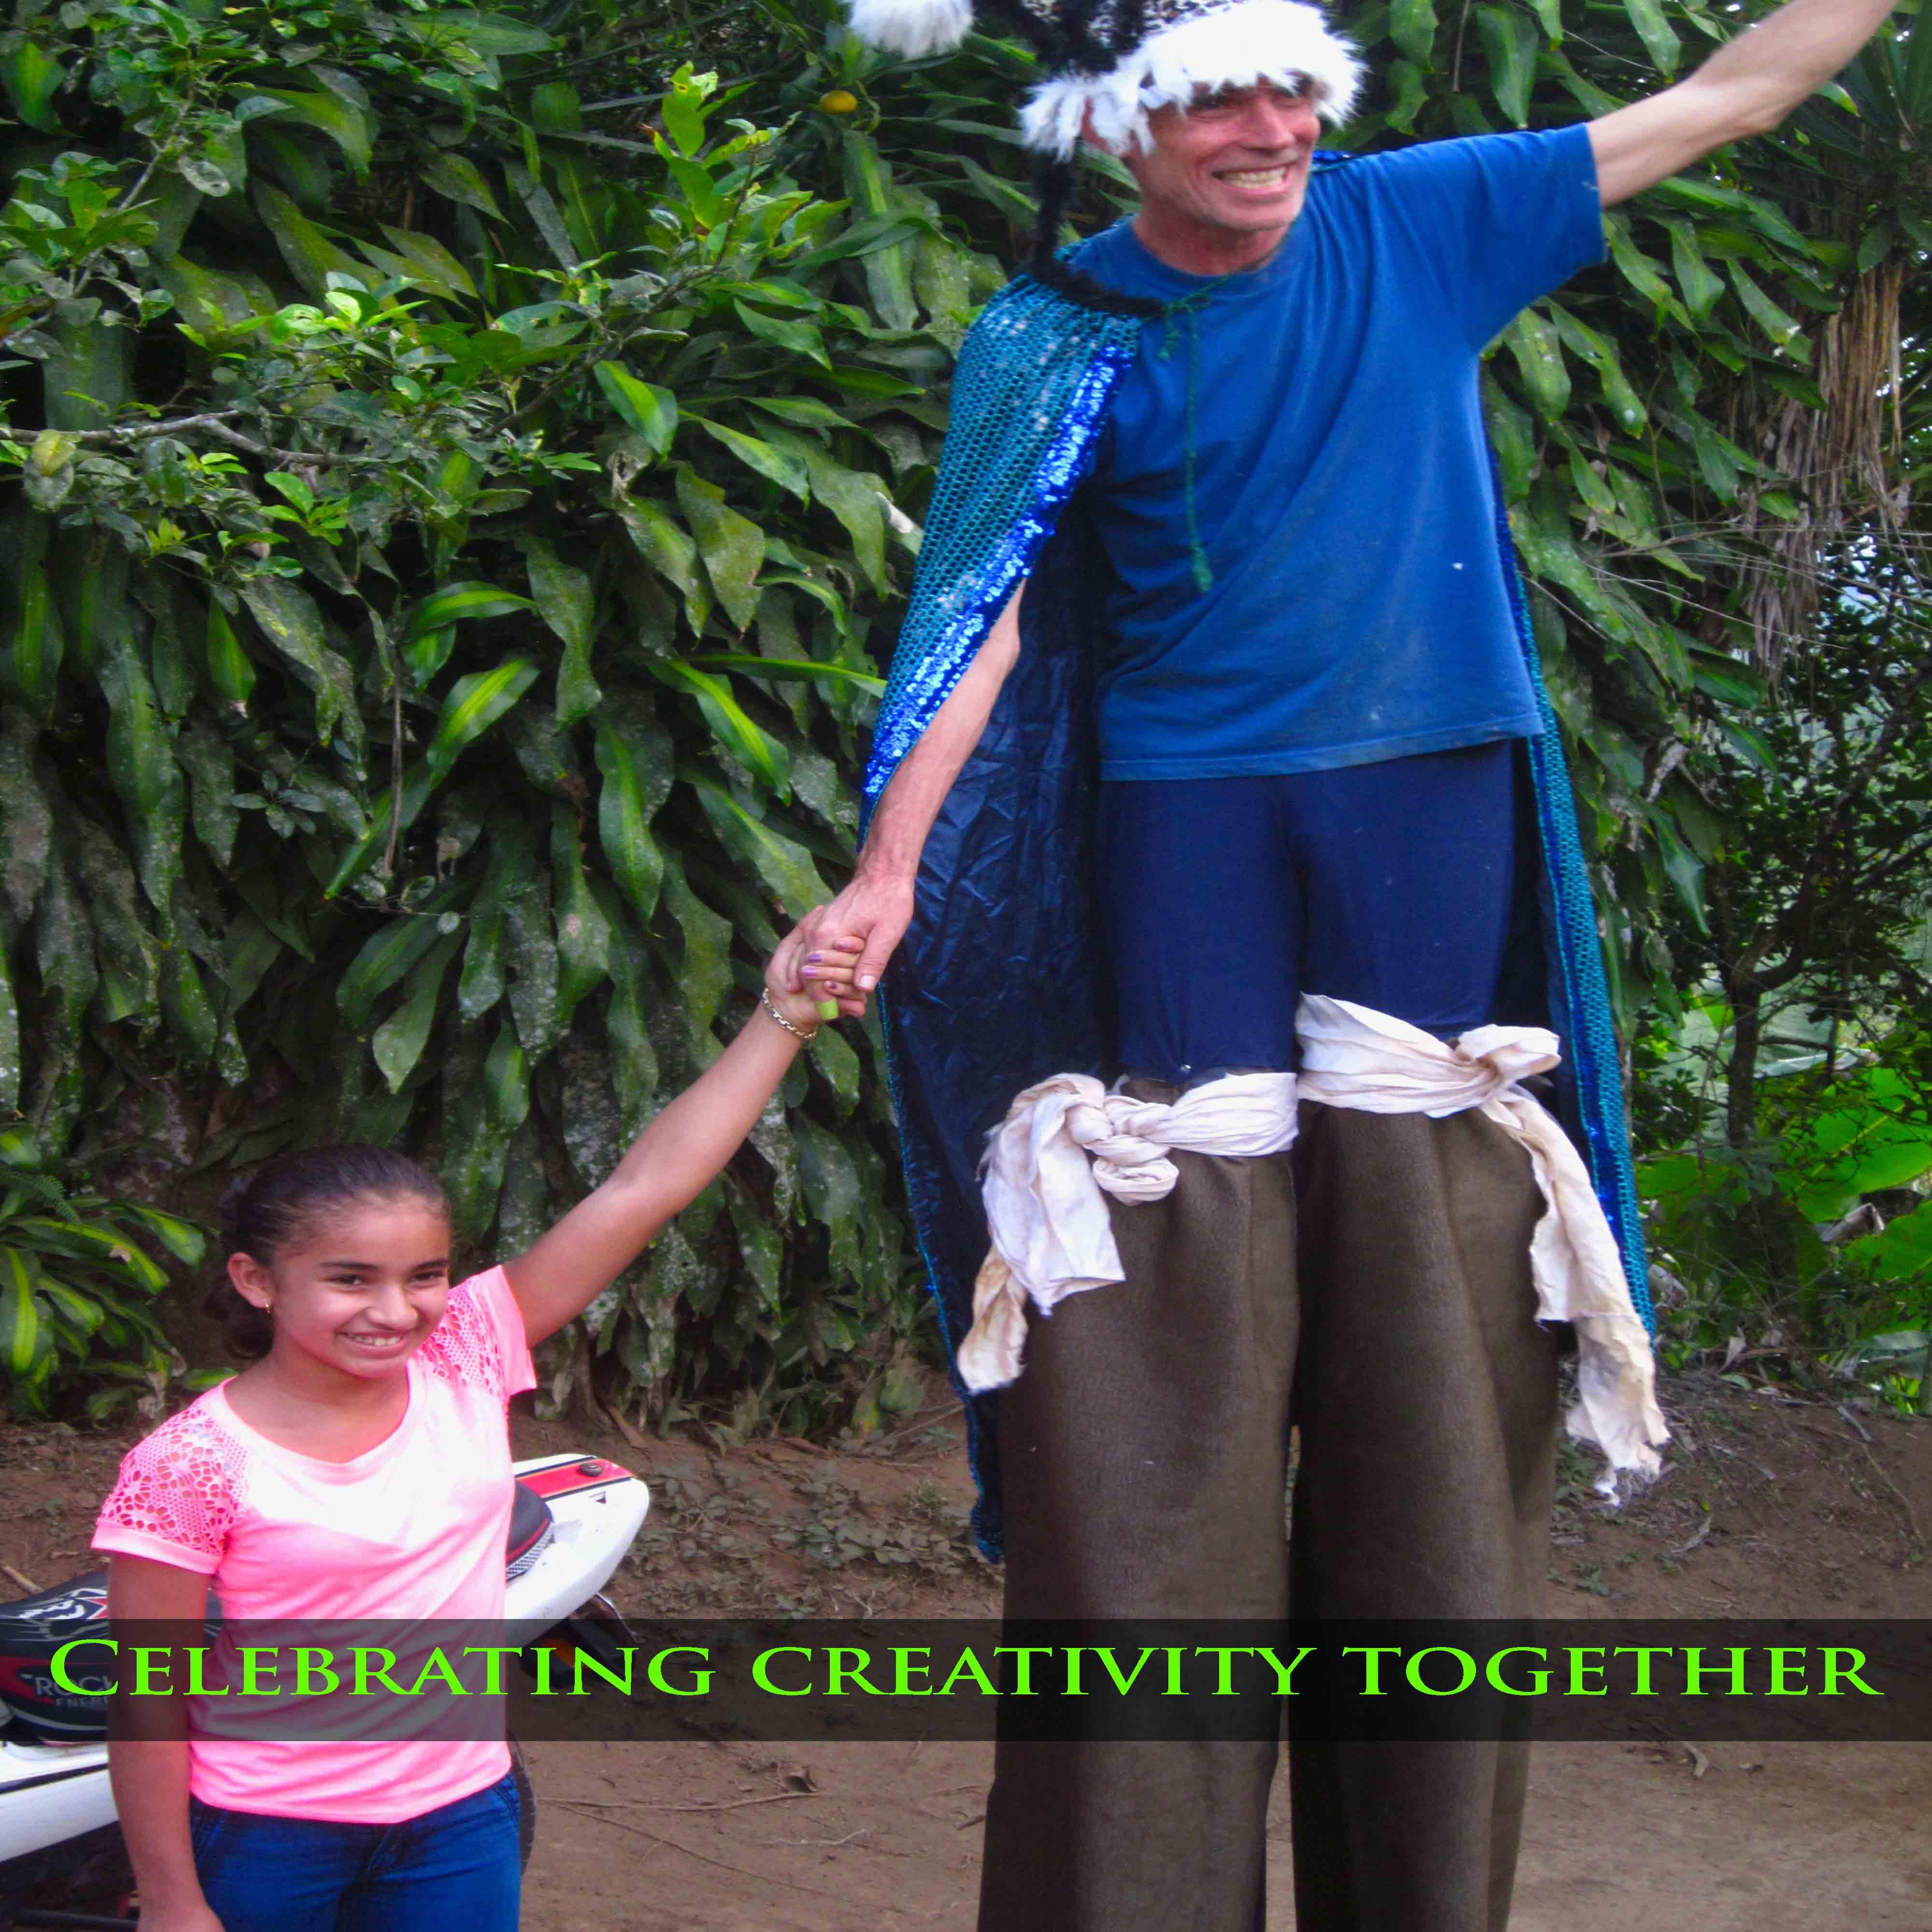 celebrating creativity together